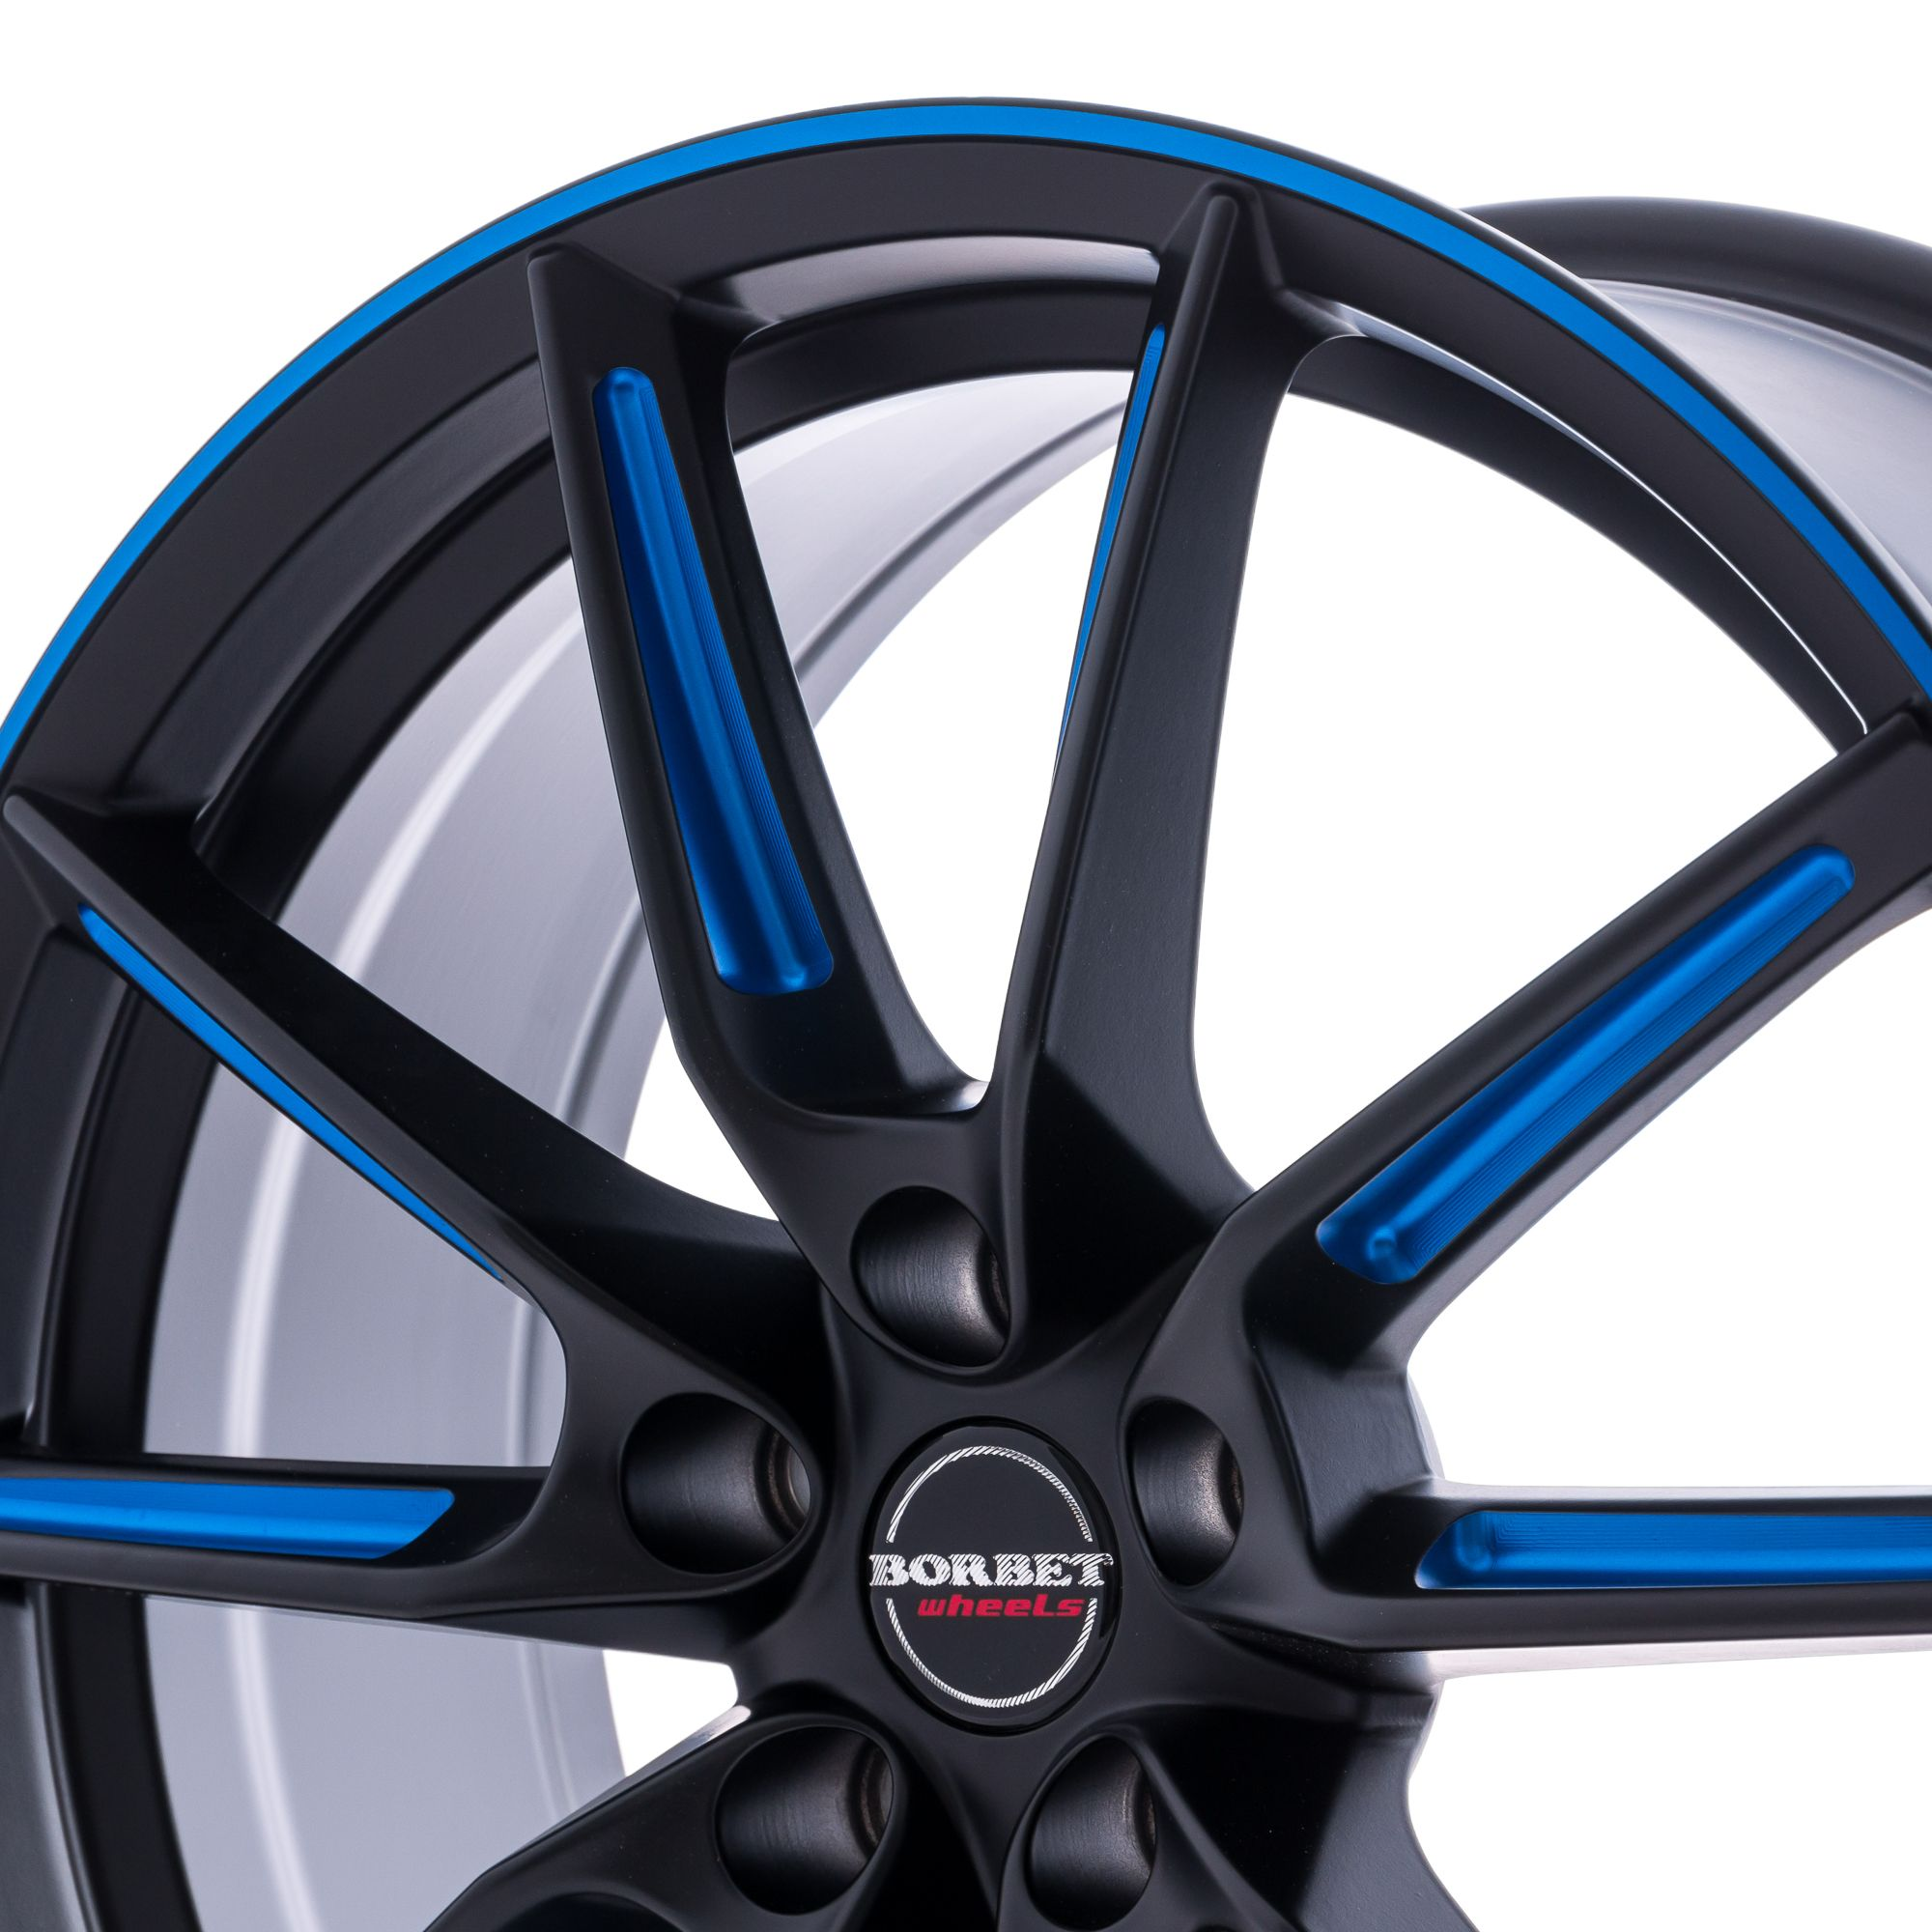 borbet lx felgen black matt spoke rim blue polished schwarz blau mehrfarbig in 19 zoll. Black Bedroom Furniture Sets. Home Design Ideas